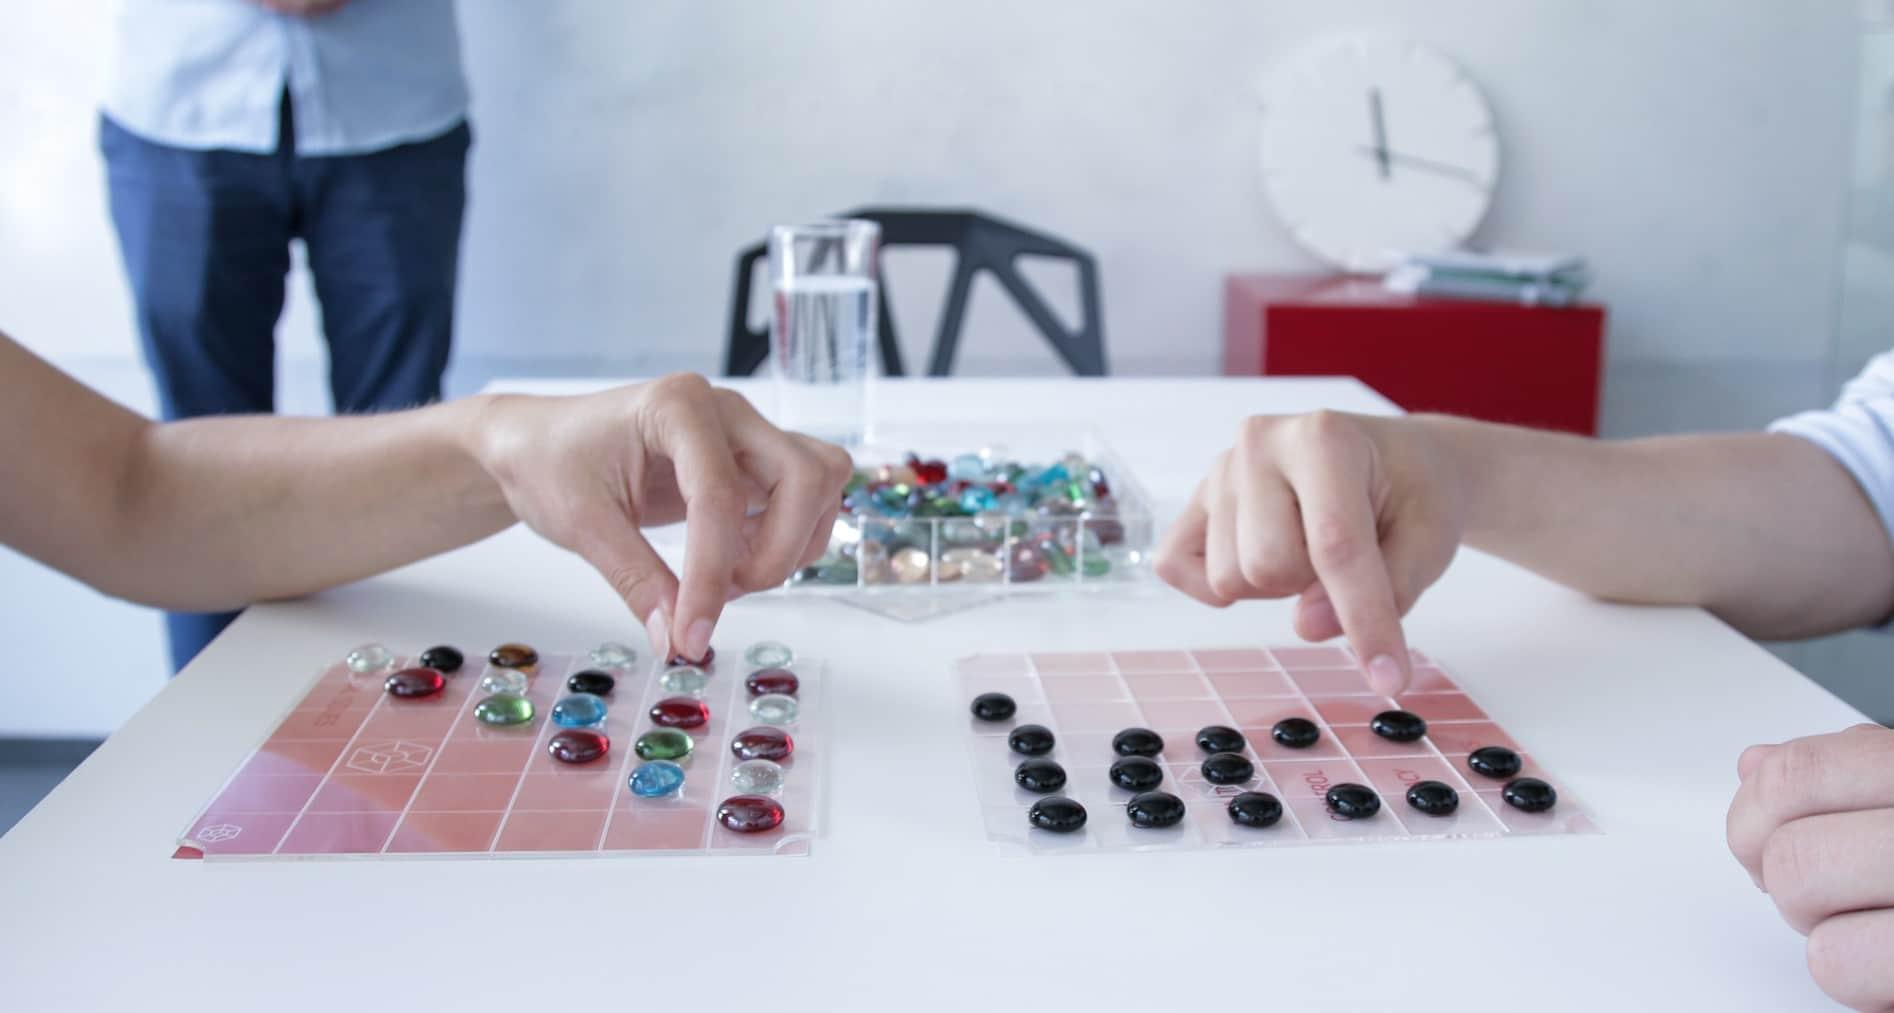 The Bead Game: Zocken mal anders. Über 100 analoge Spiele in einer Box